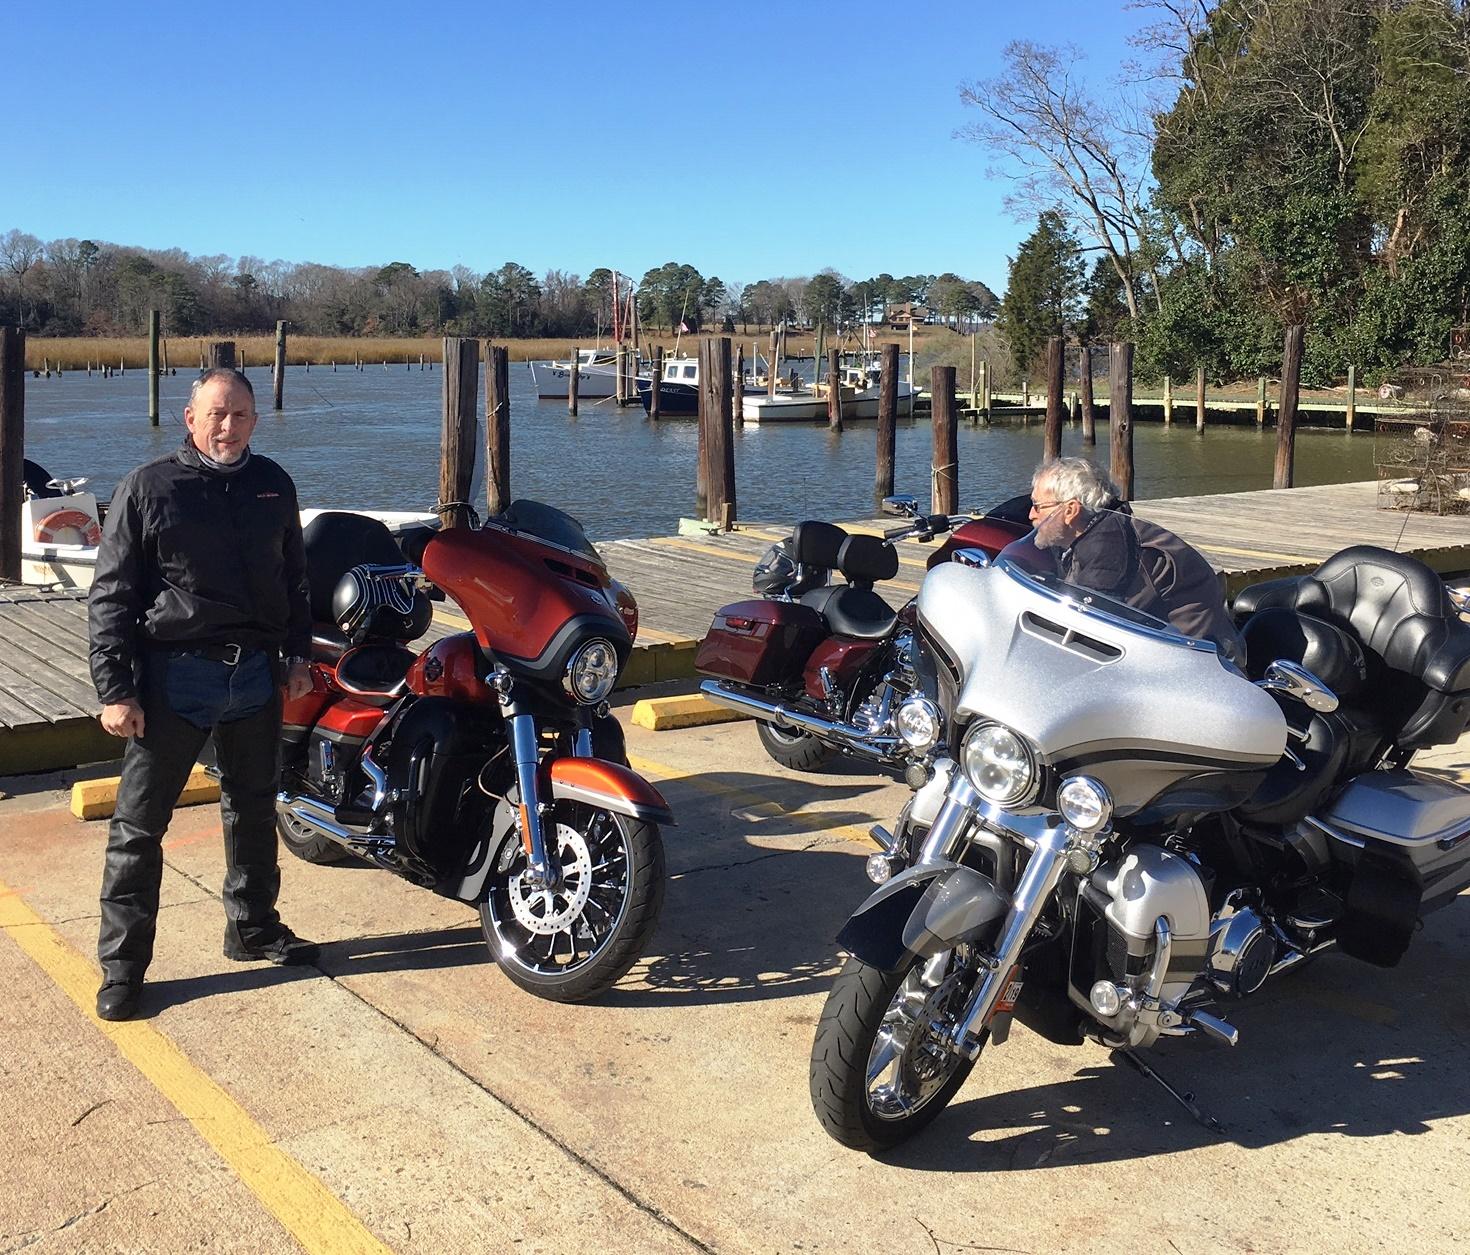 December 2018 Ride to Rescue, VA